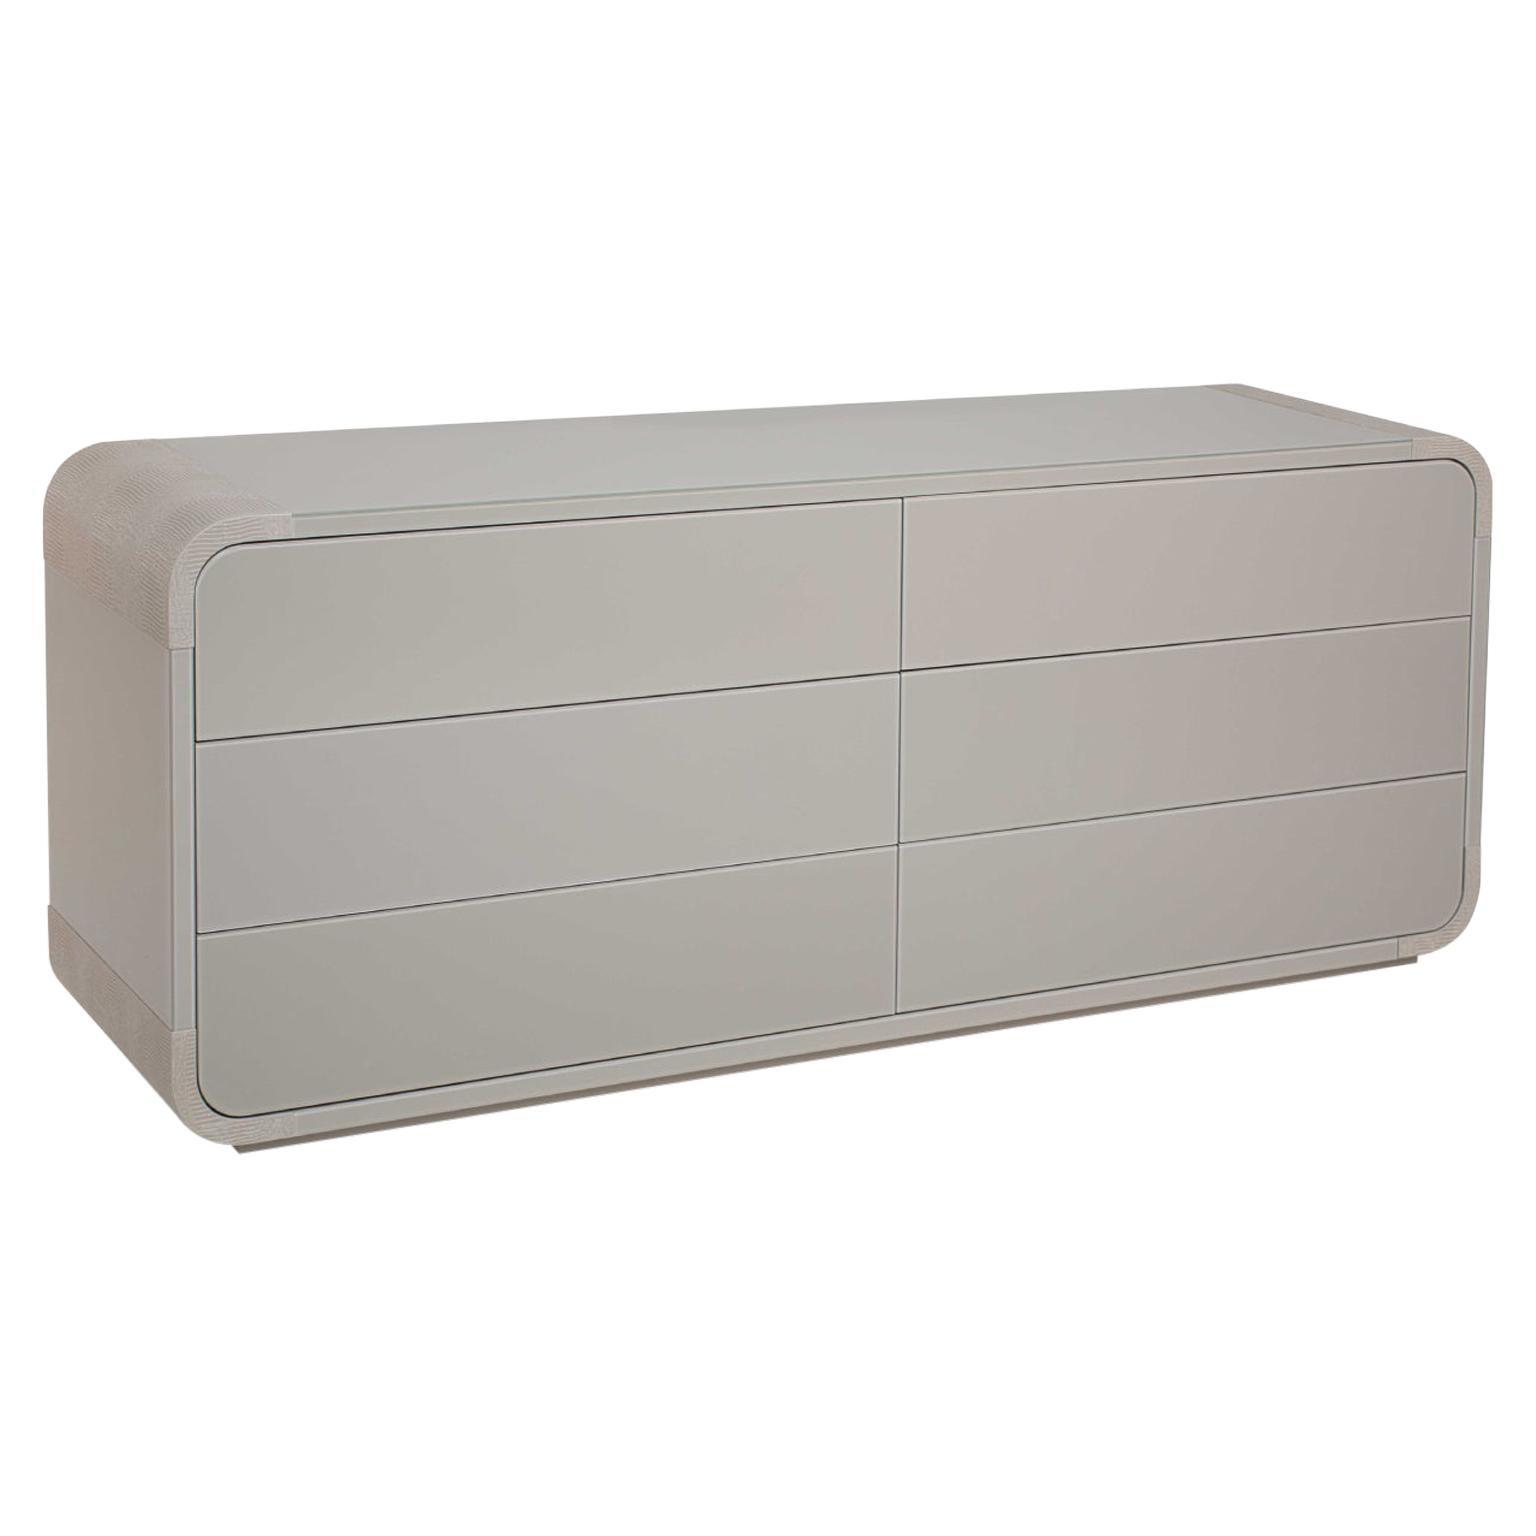 Dresser with Drawers, Puglia Dresser